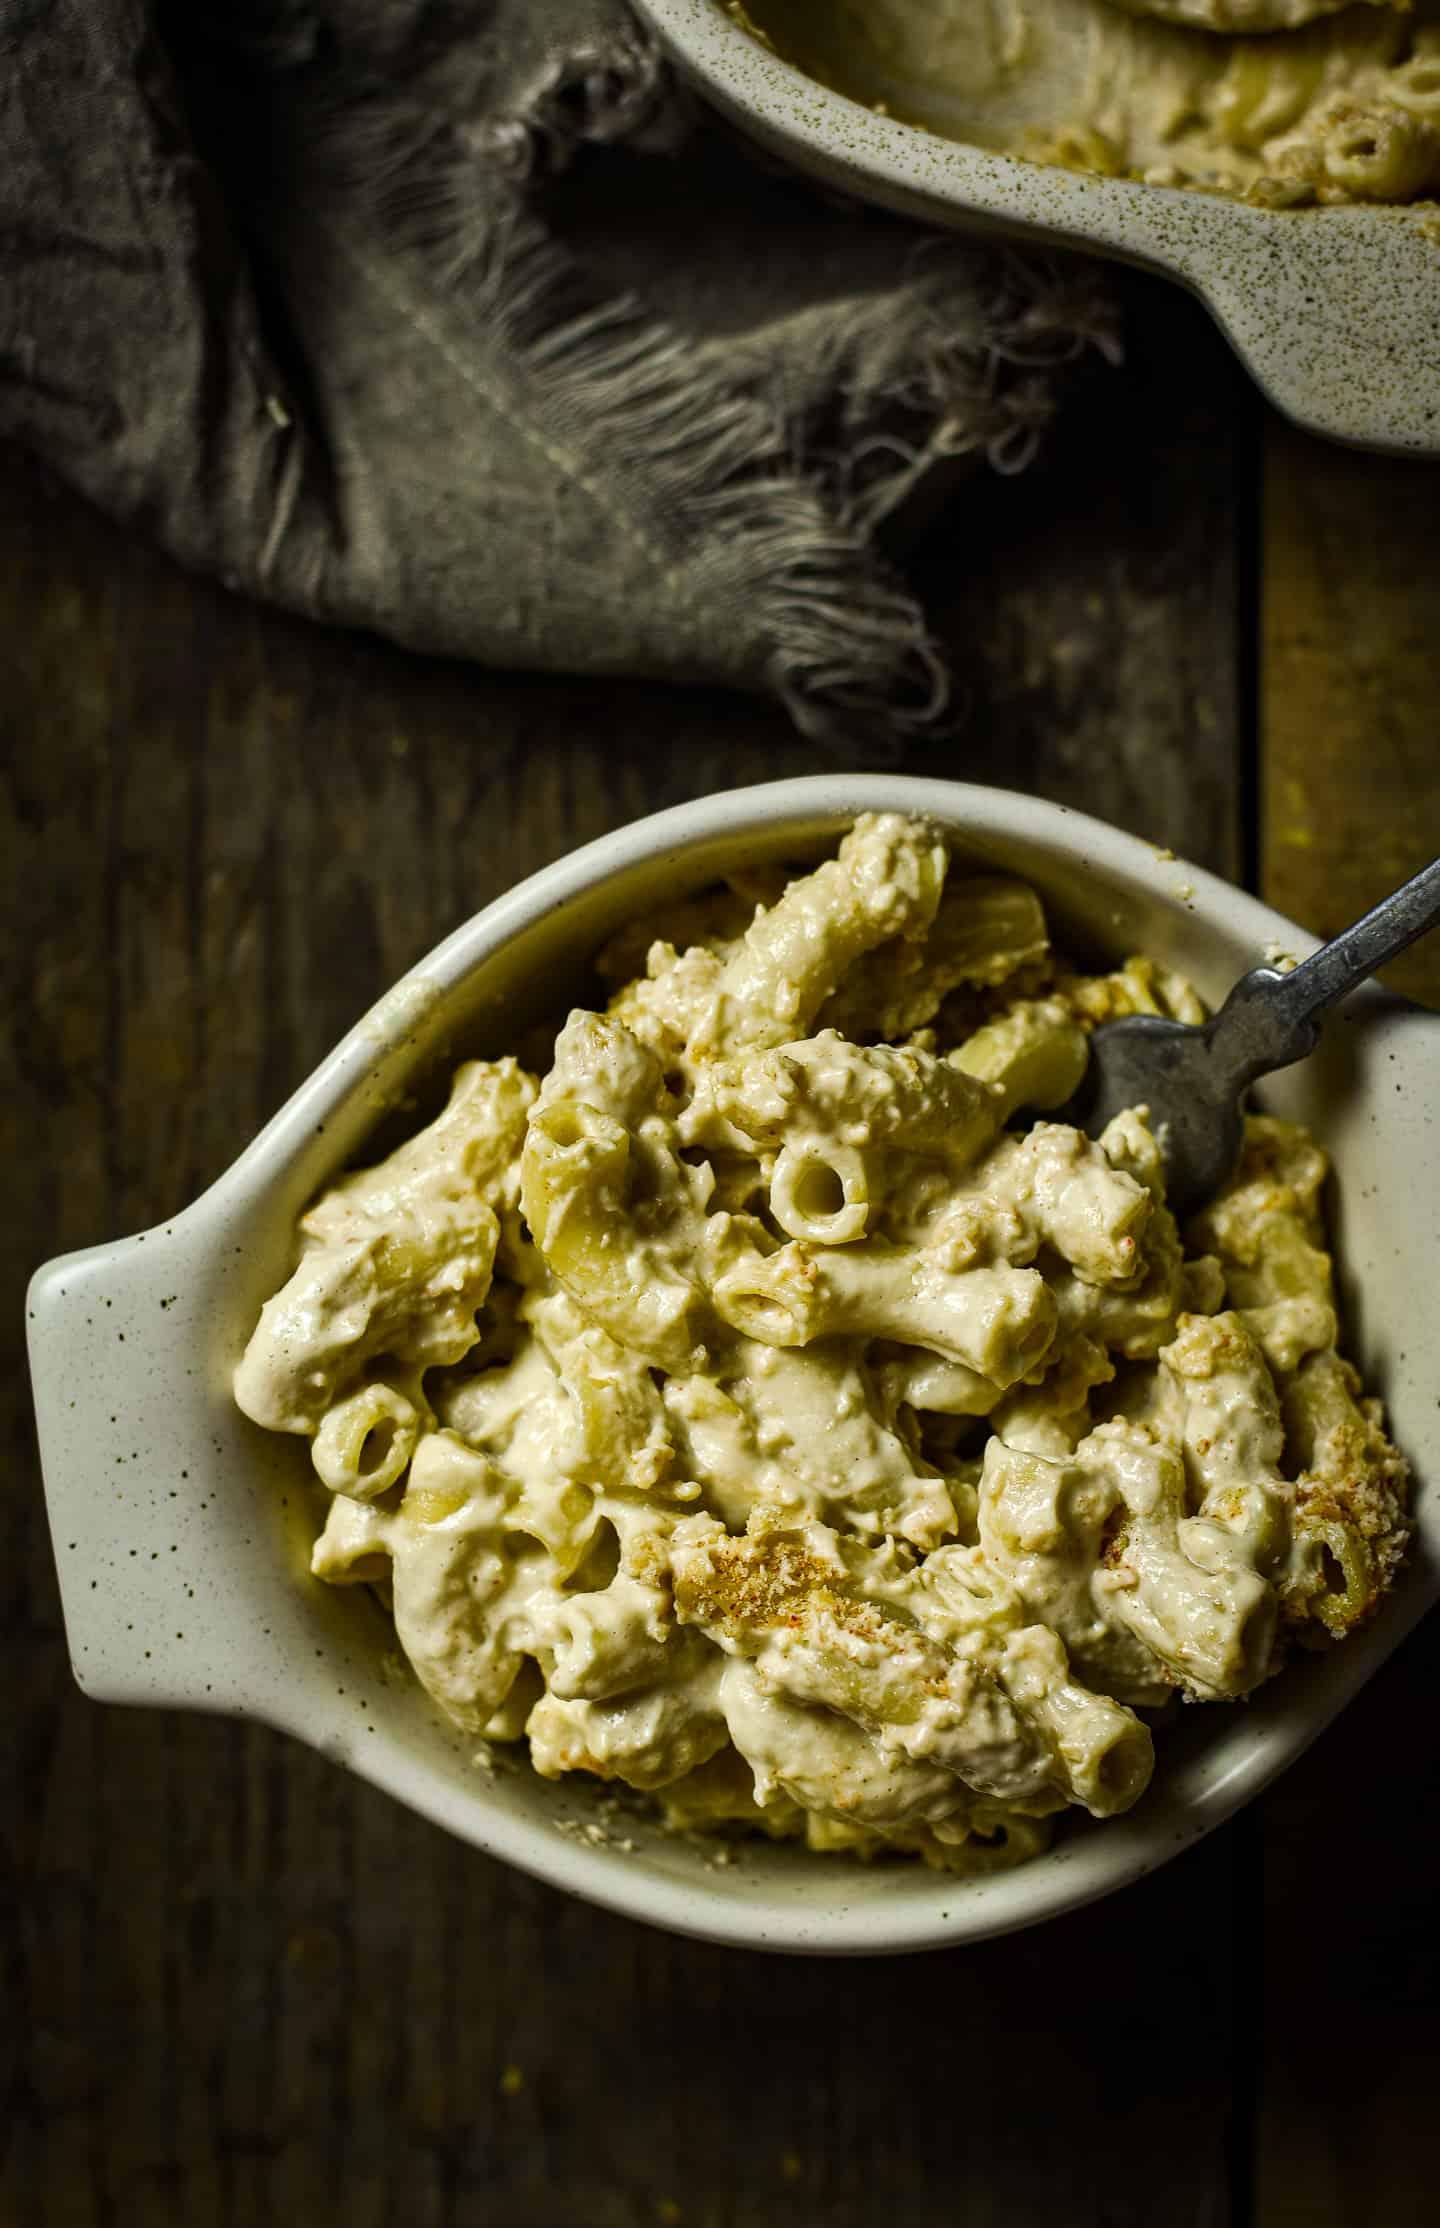 Bowl of macaroni and cheese.